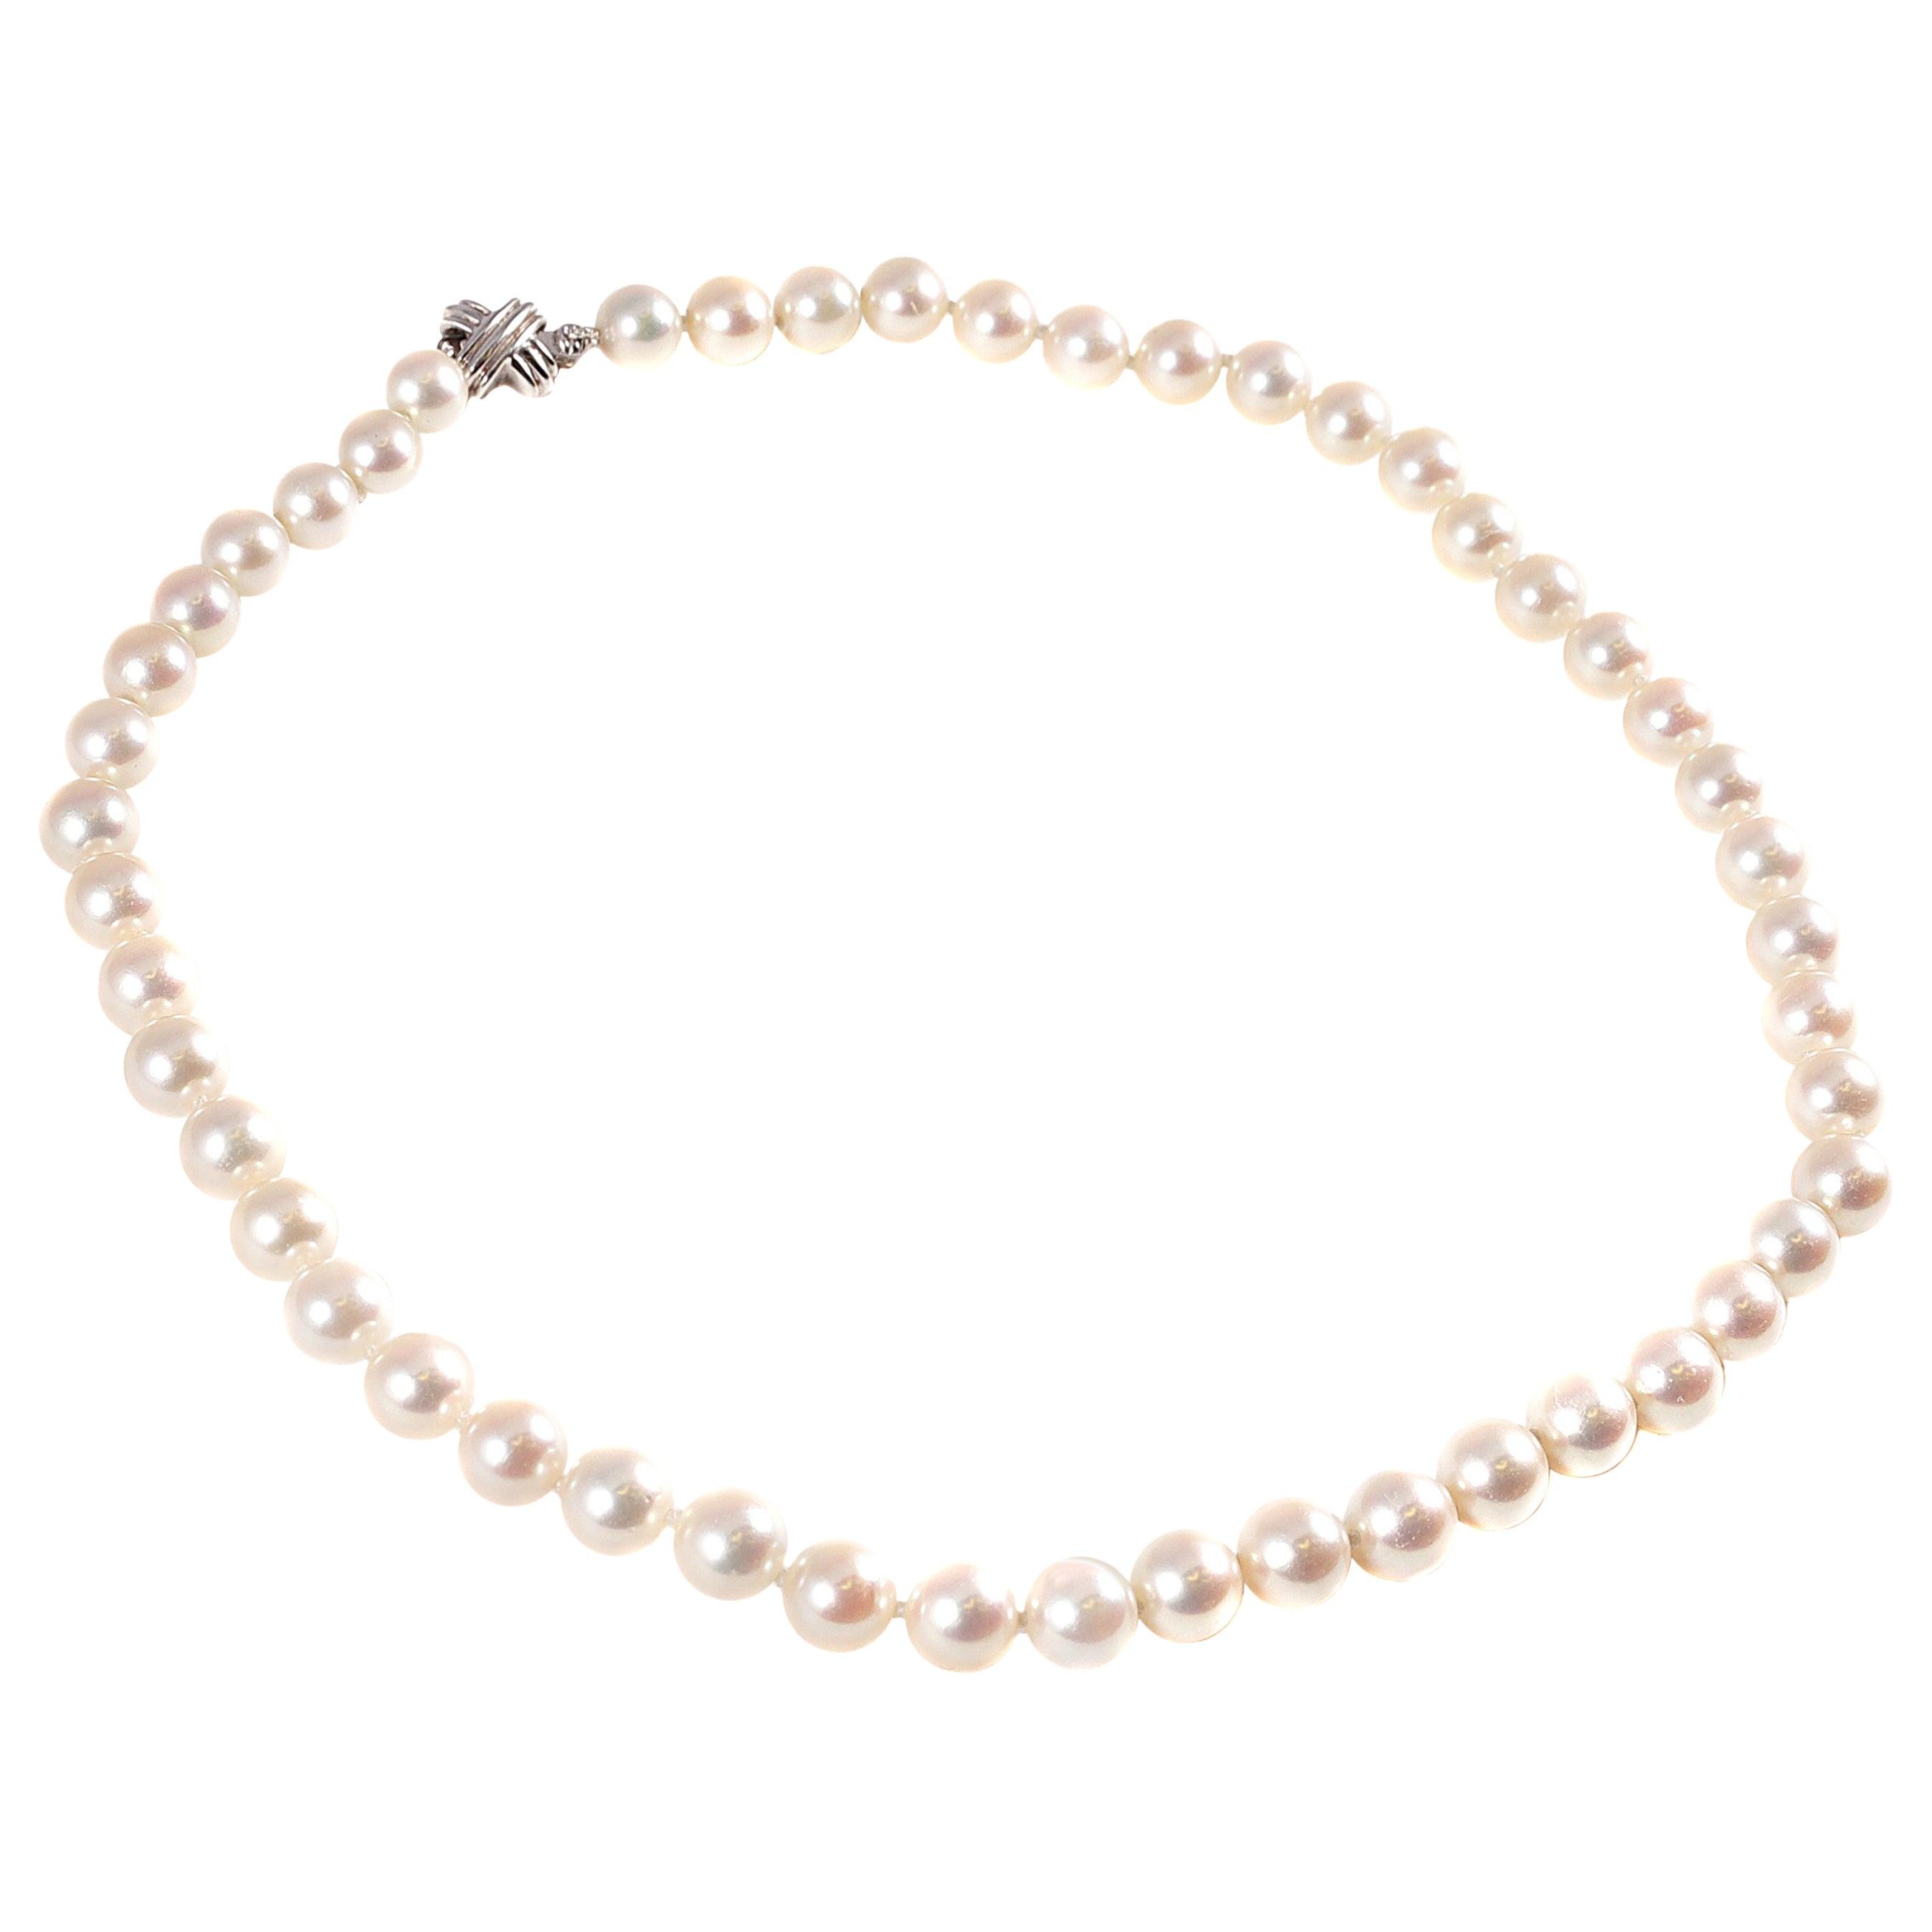 Tiffany & Co. Strand of Pearls